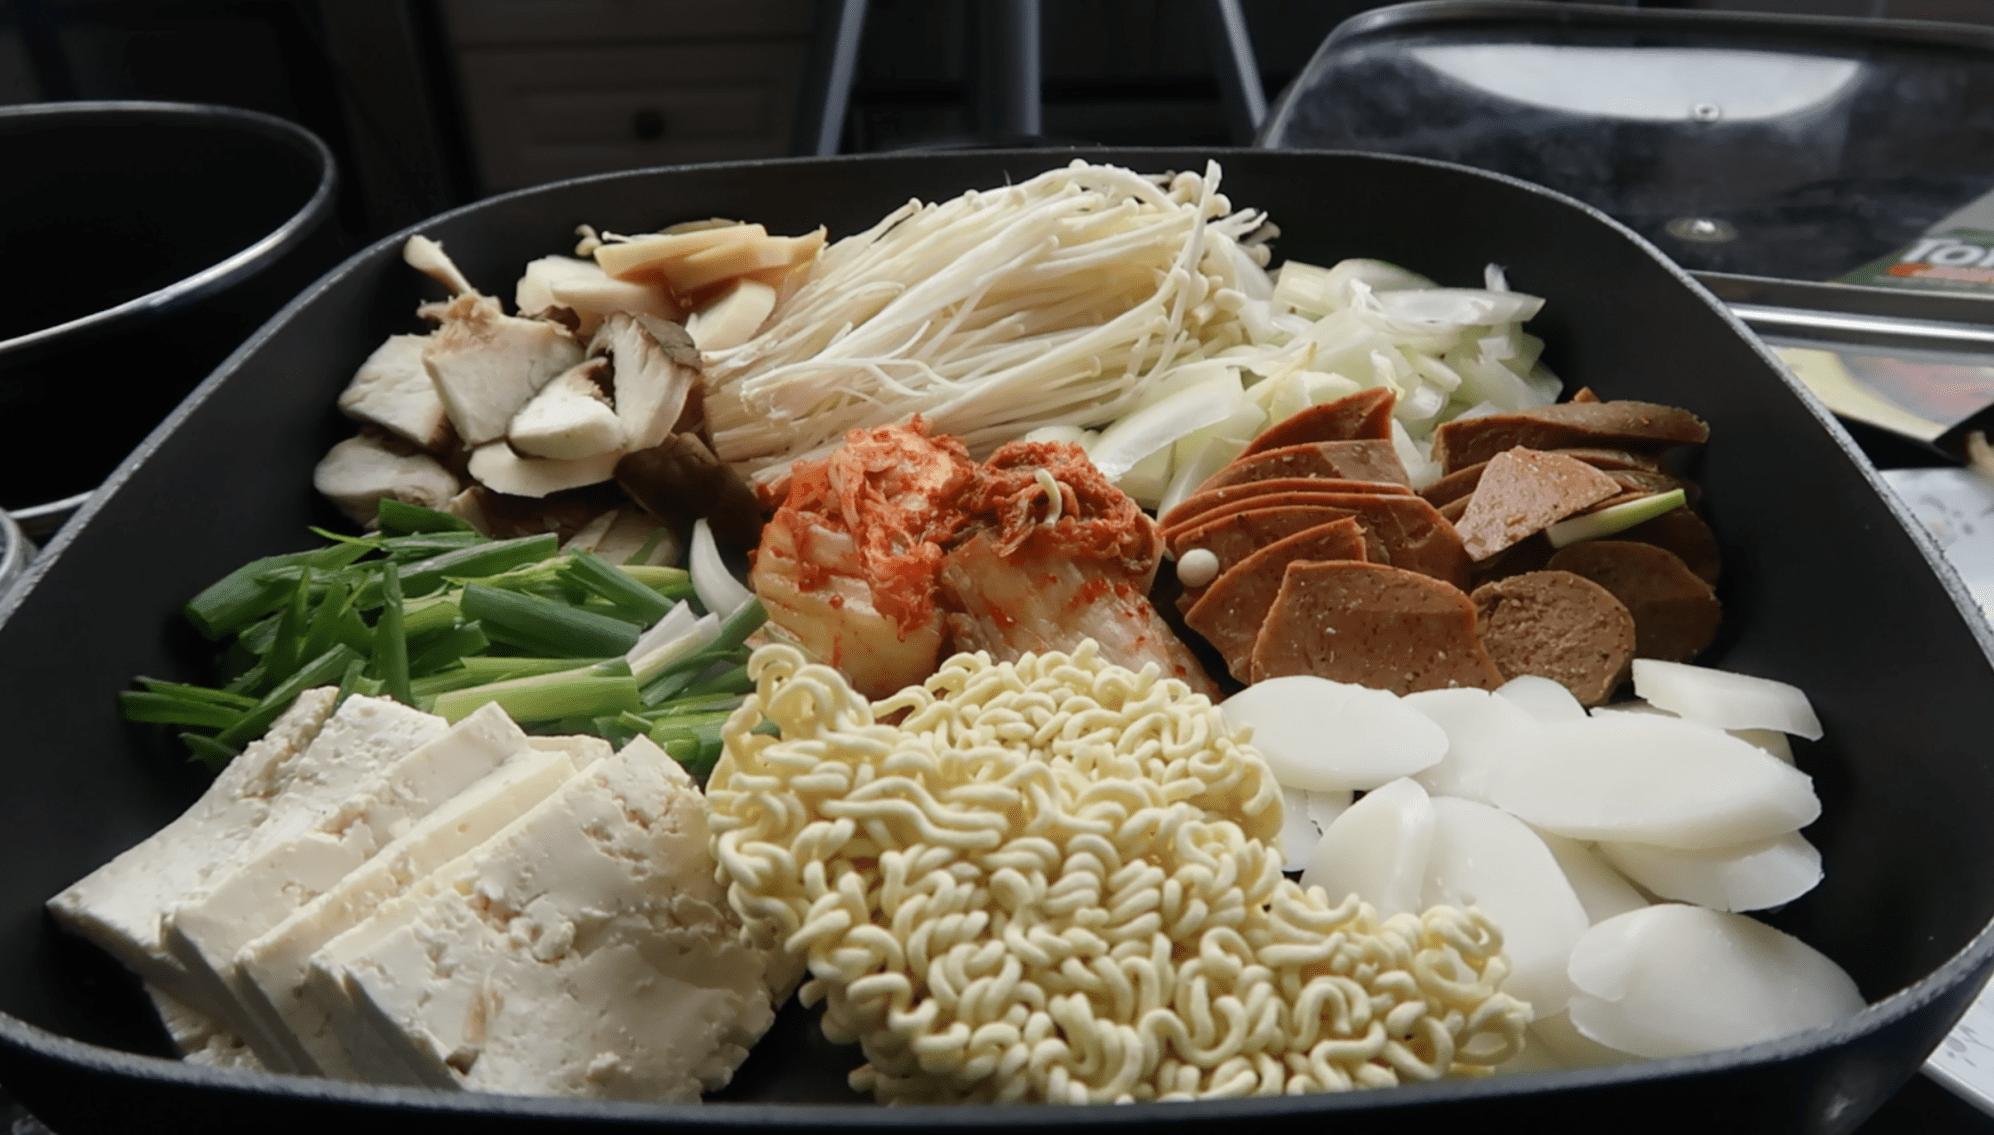 Vegan Budaejjigae Korean Army Base Stew Recipe Mukbang Stew Recipes Army Base Stew Recipe Recipes